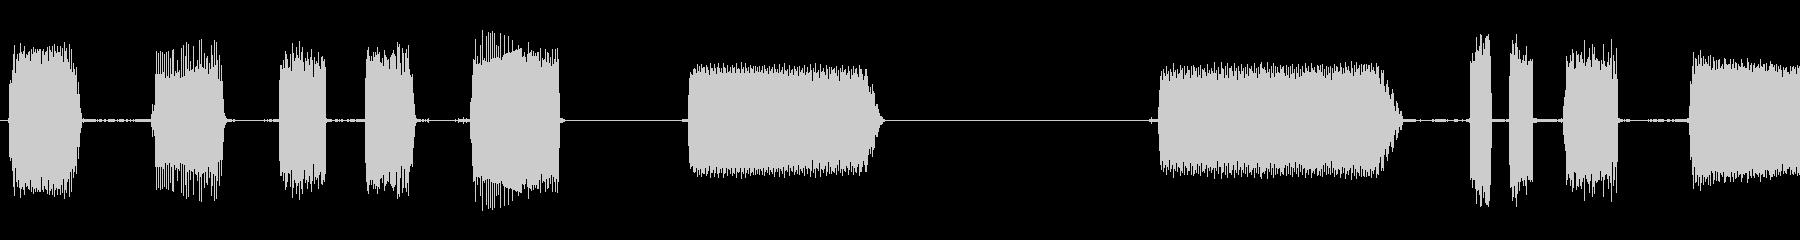 Android用語集ビープ音1の未再生の波形